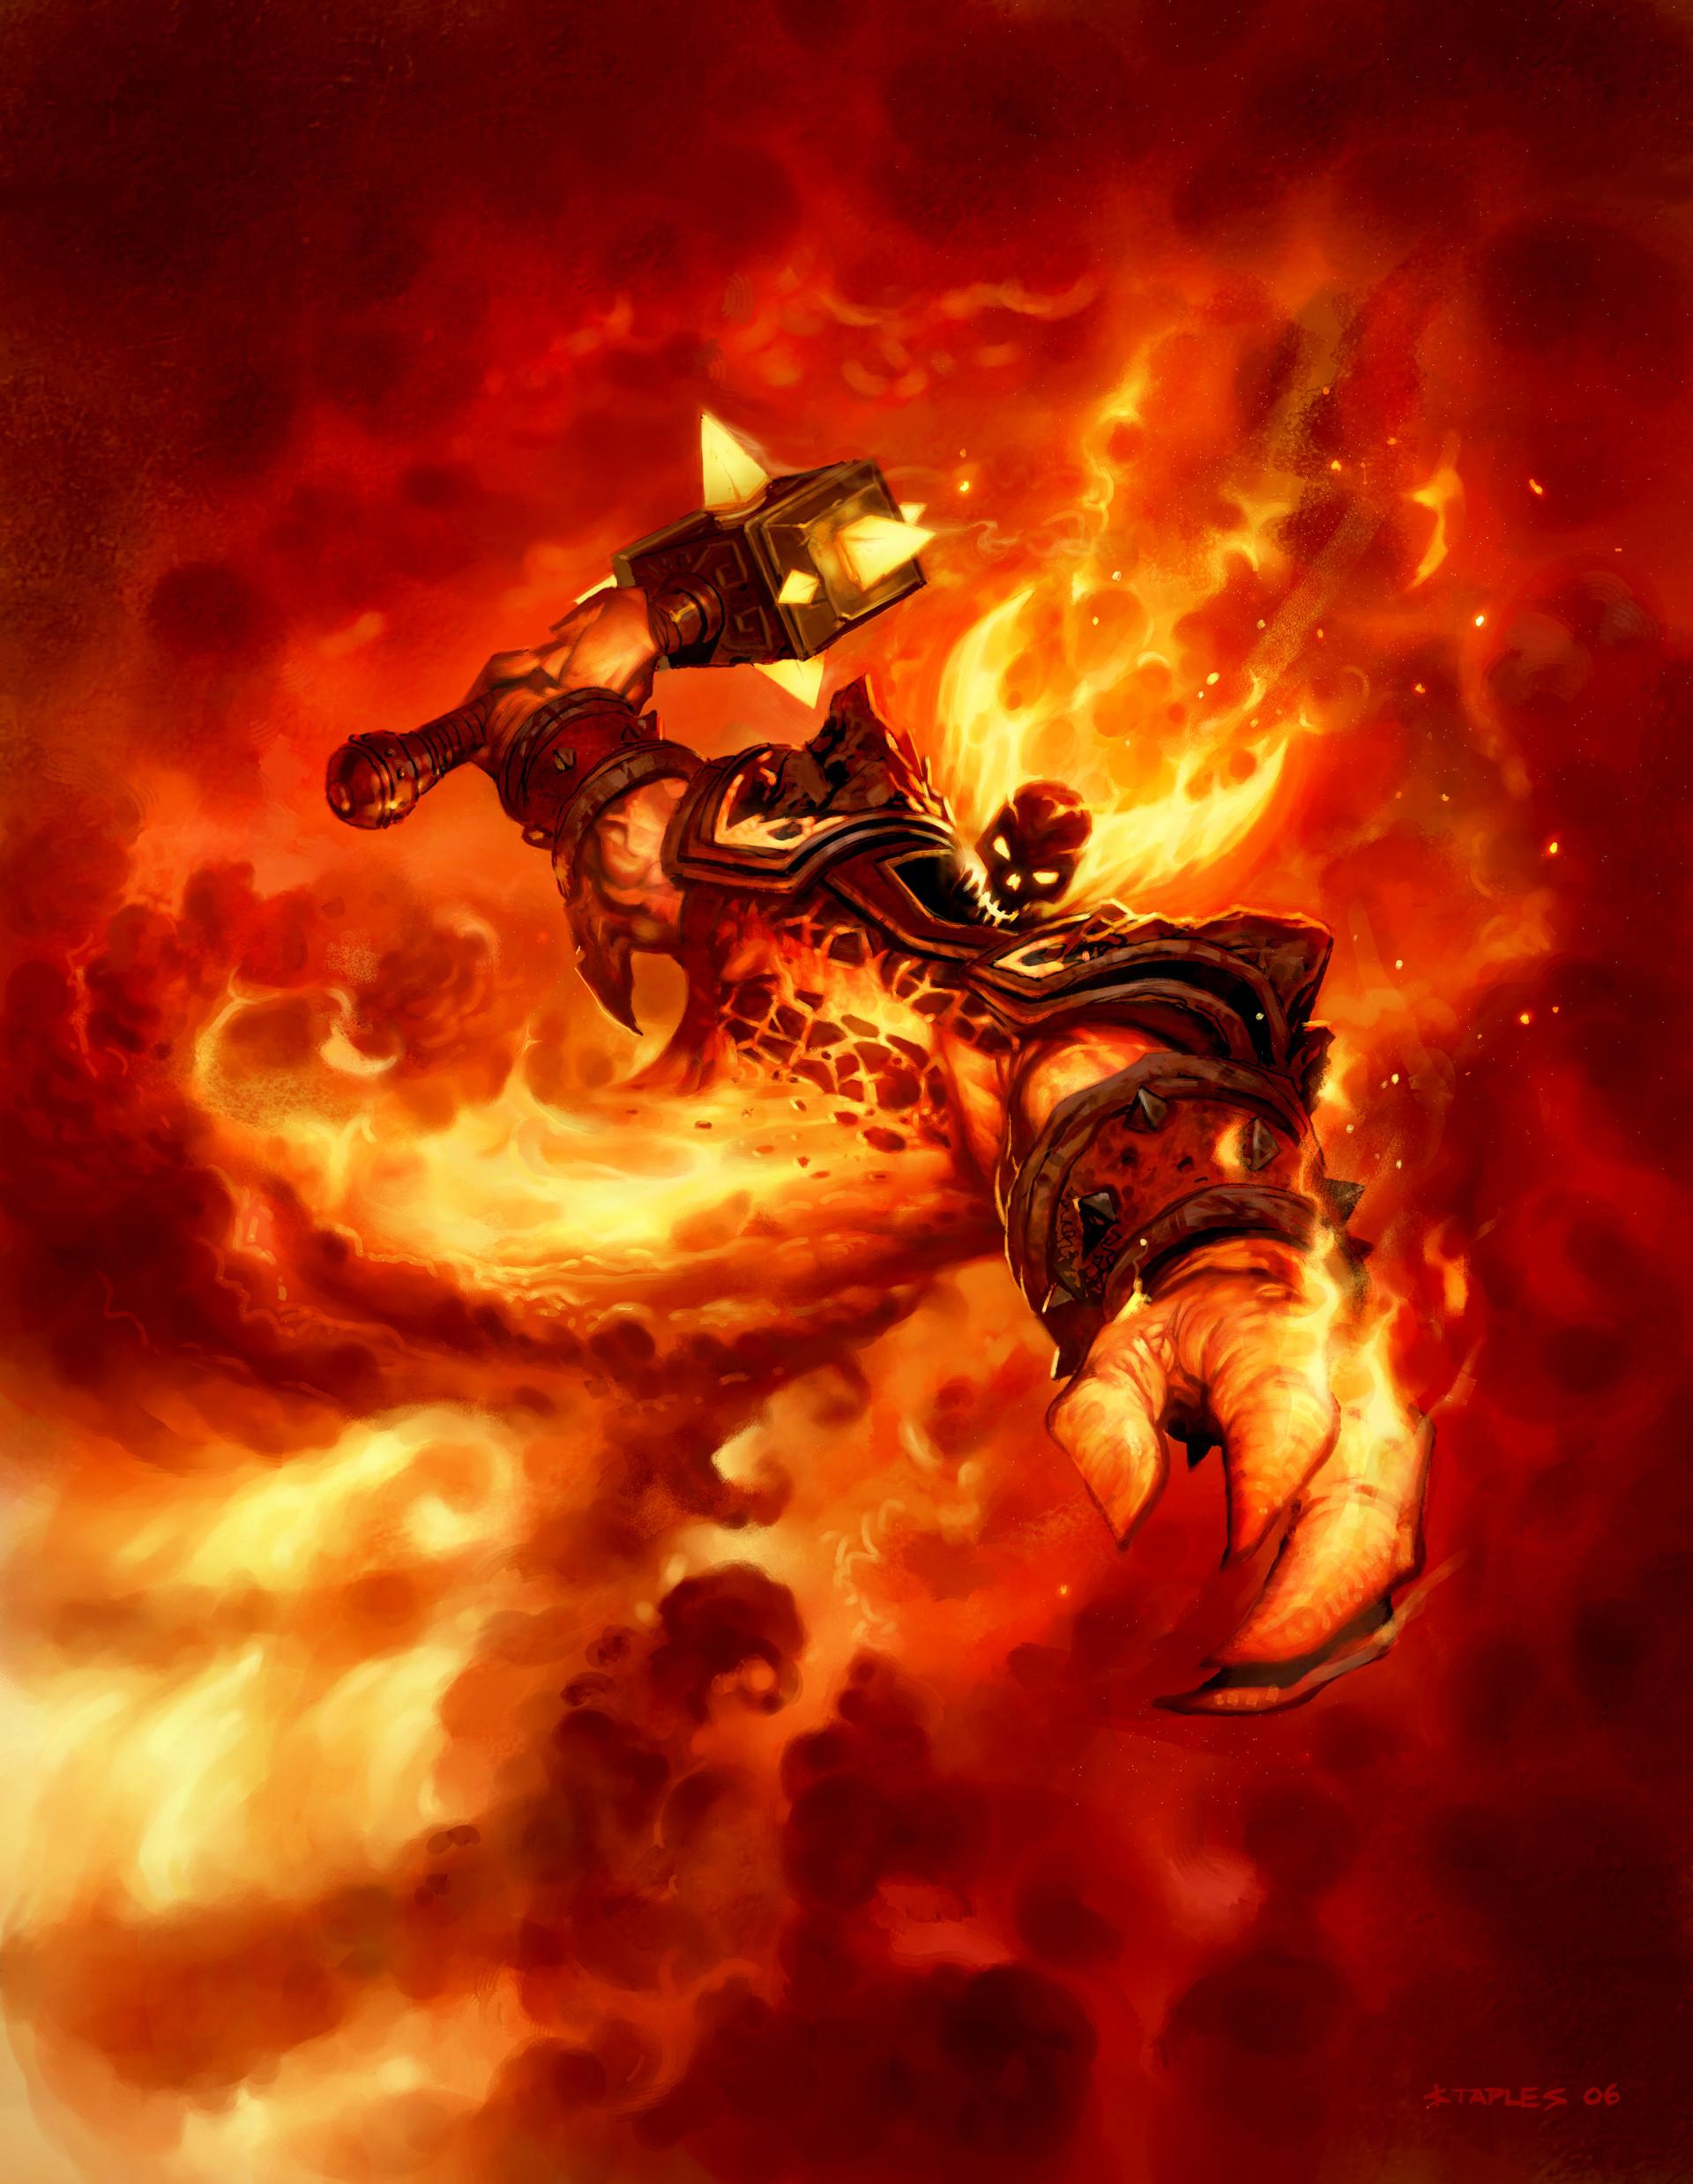 Fantasy Wallpaper Artstation Ragnaros The Firelord For Hearthstone Greg